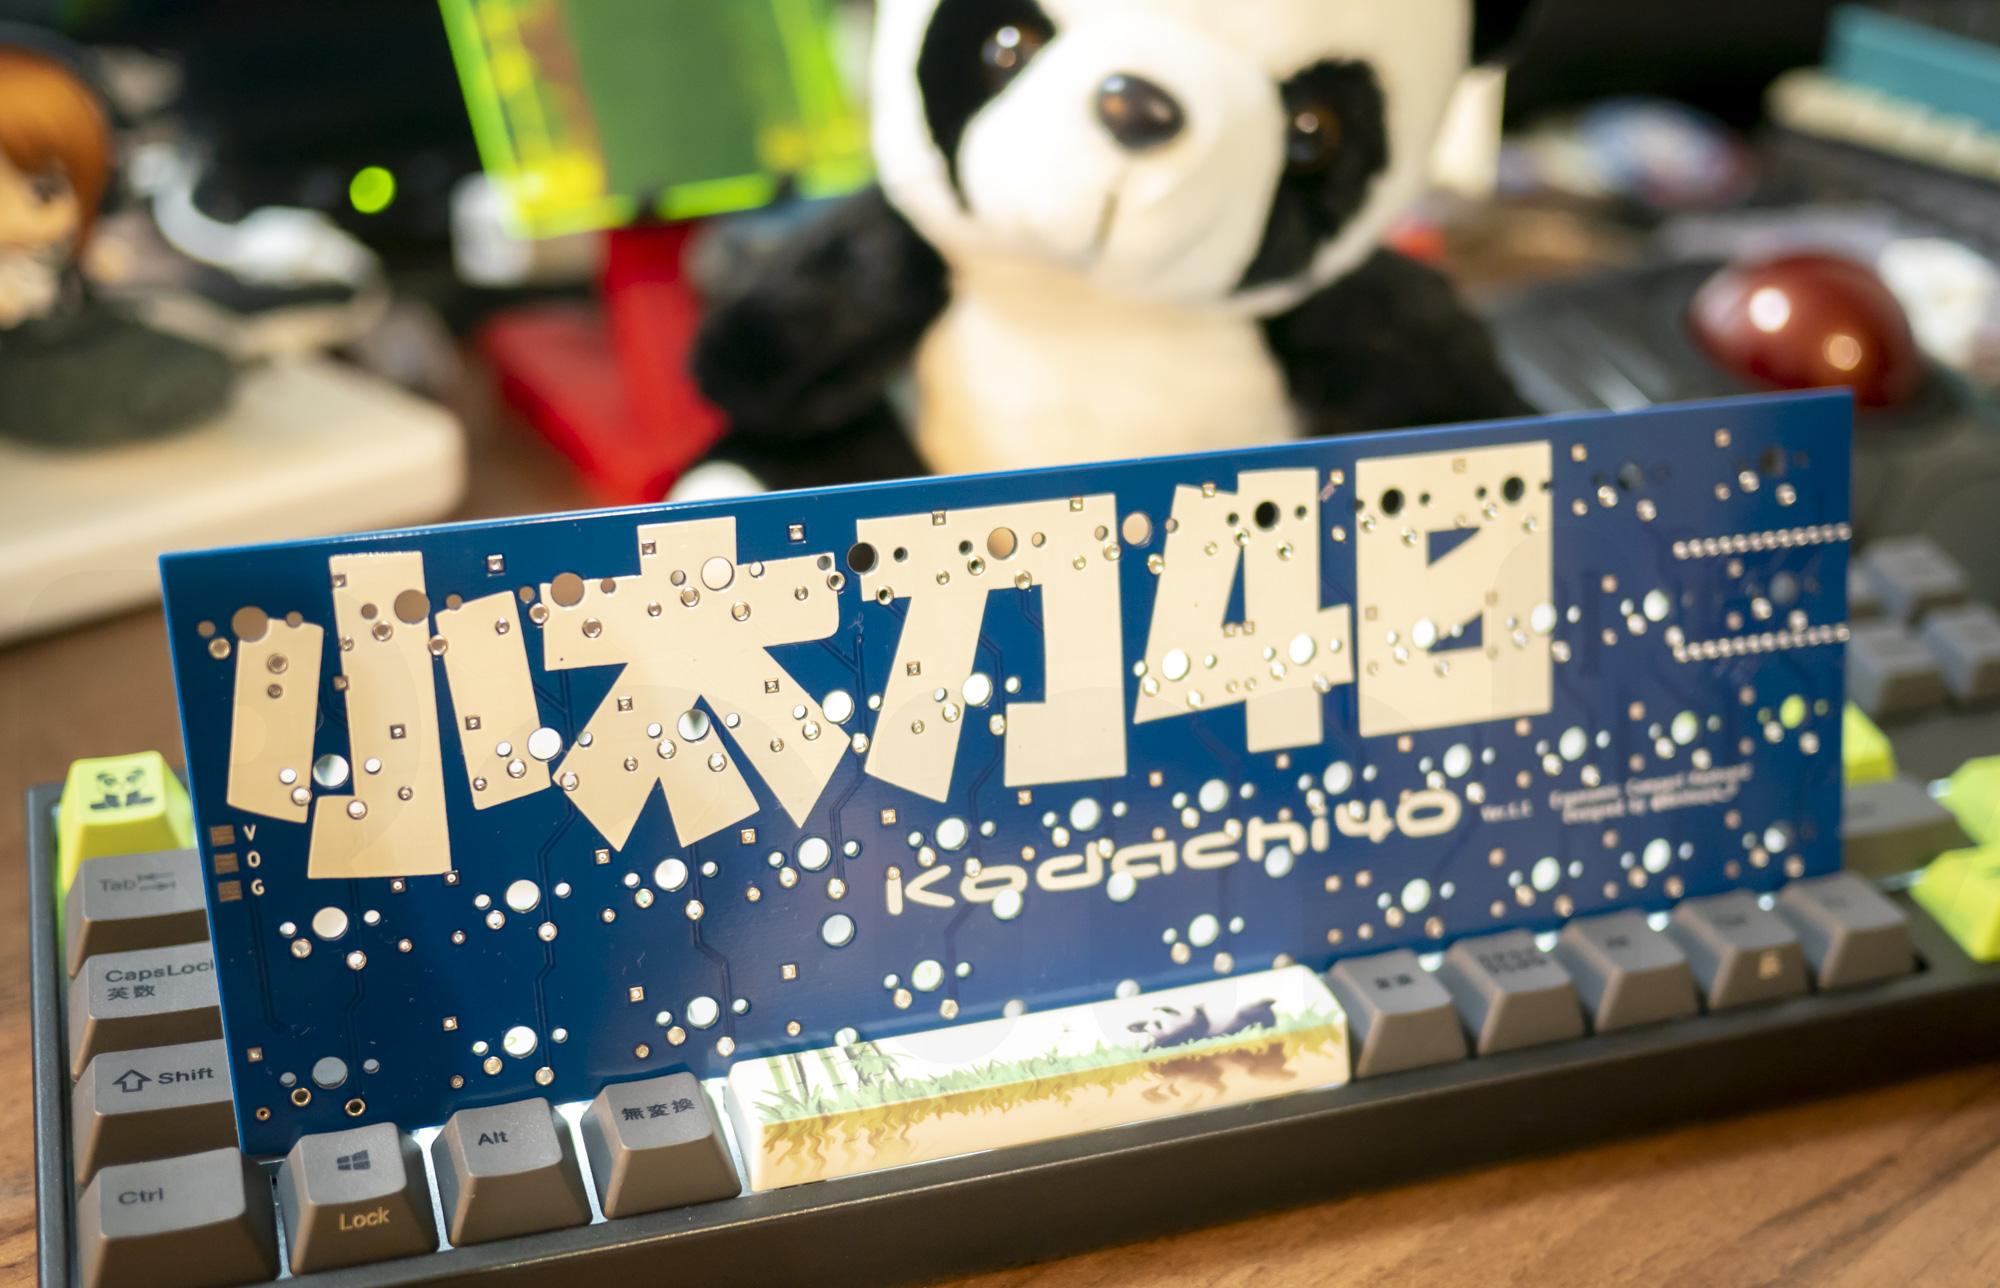 小太刀48 PCB